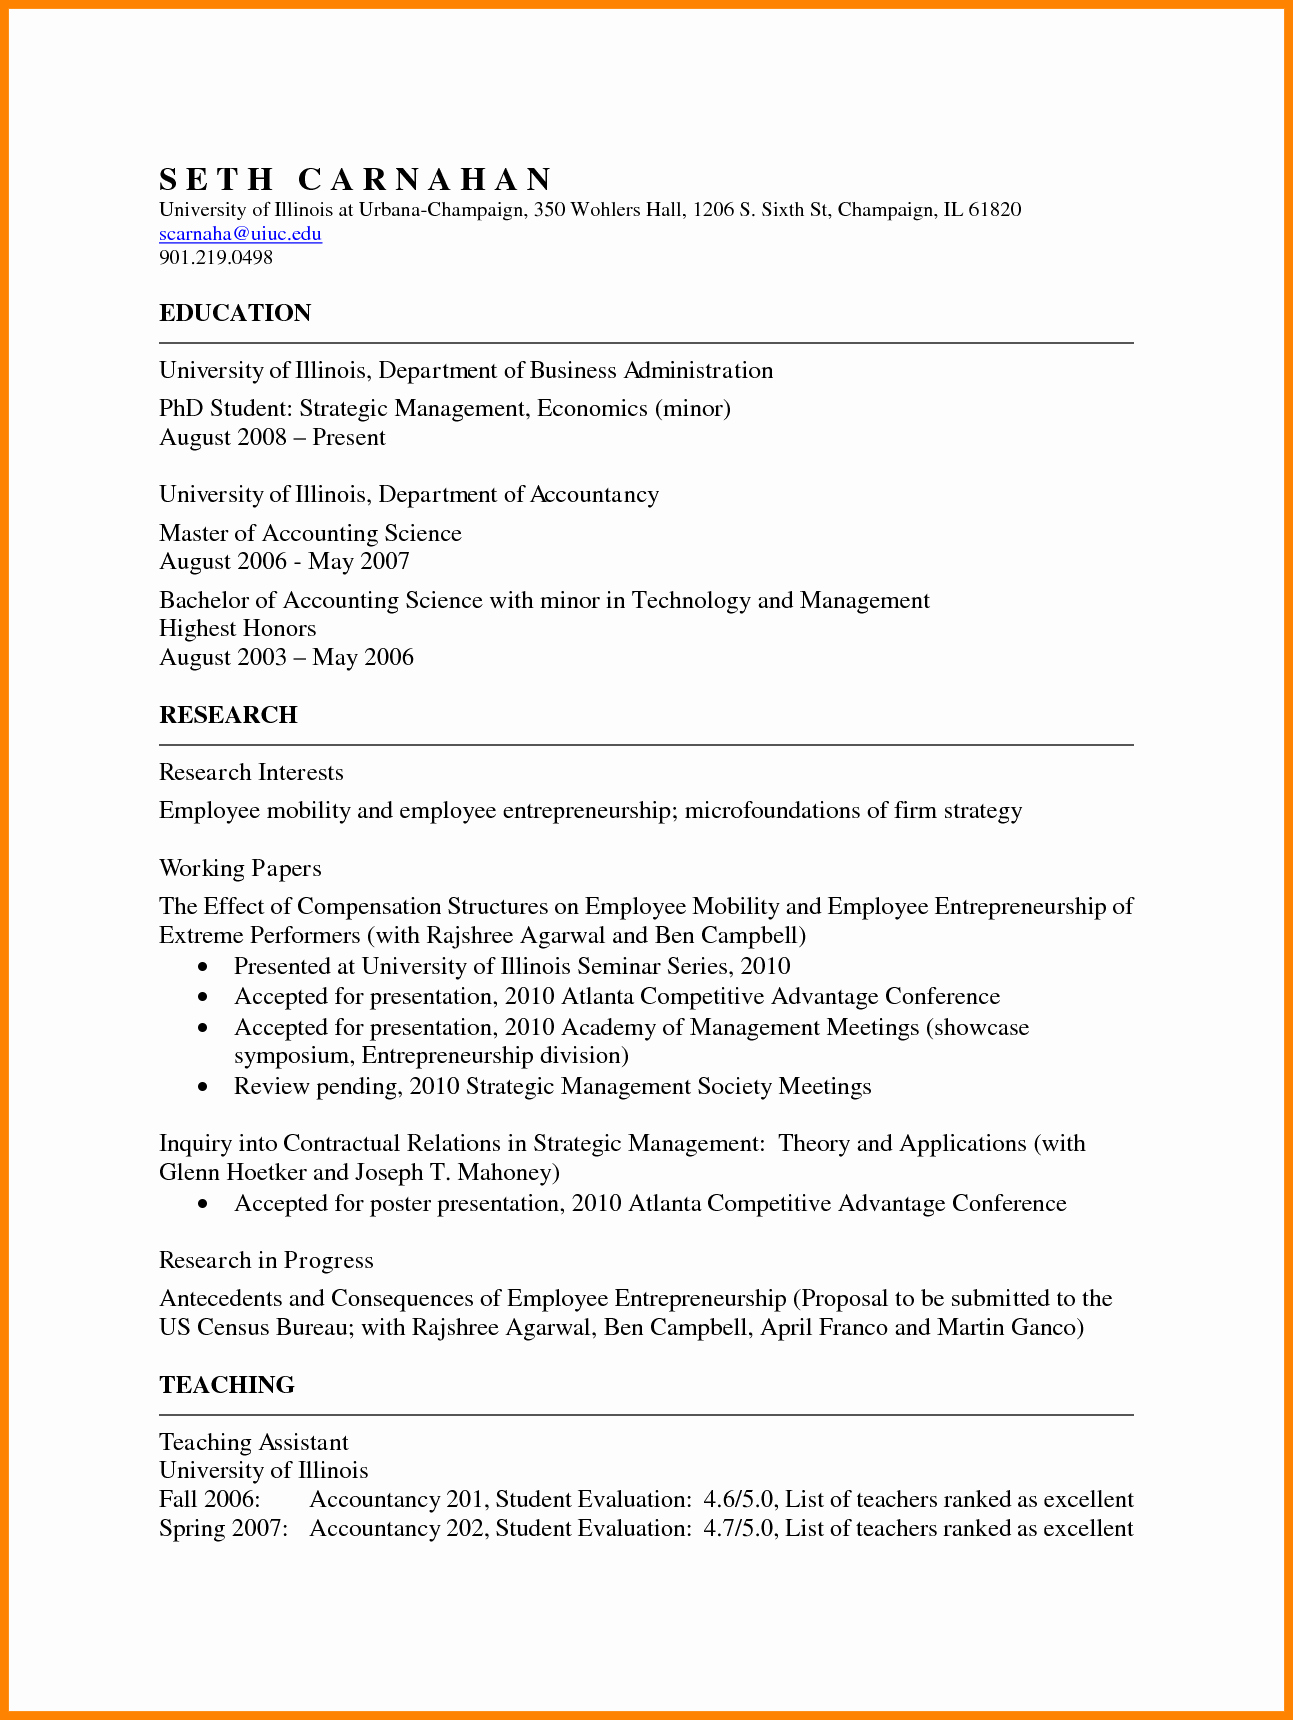 Academic Cv Template Word Lovely 5 Academic Resume Template Word